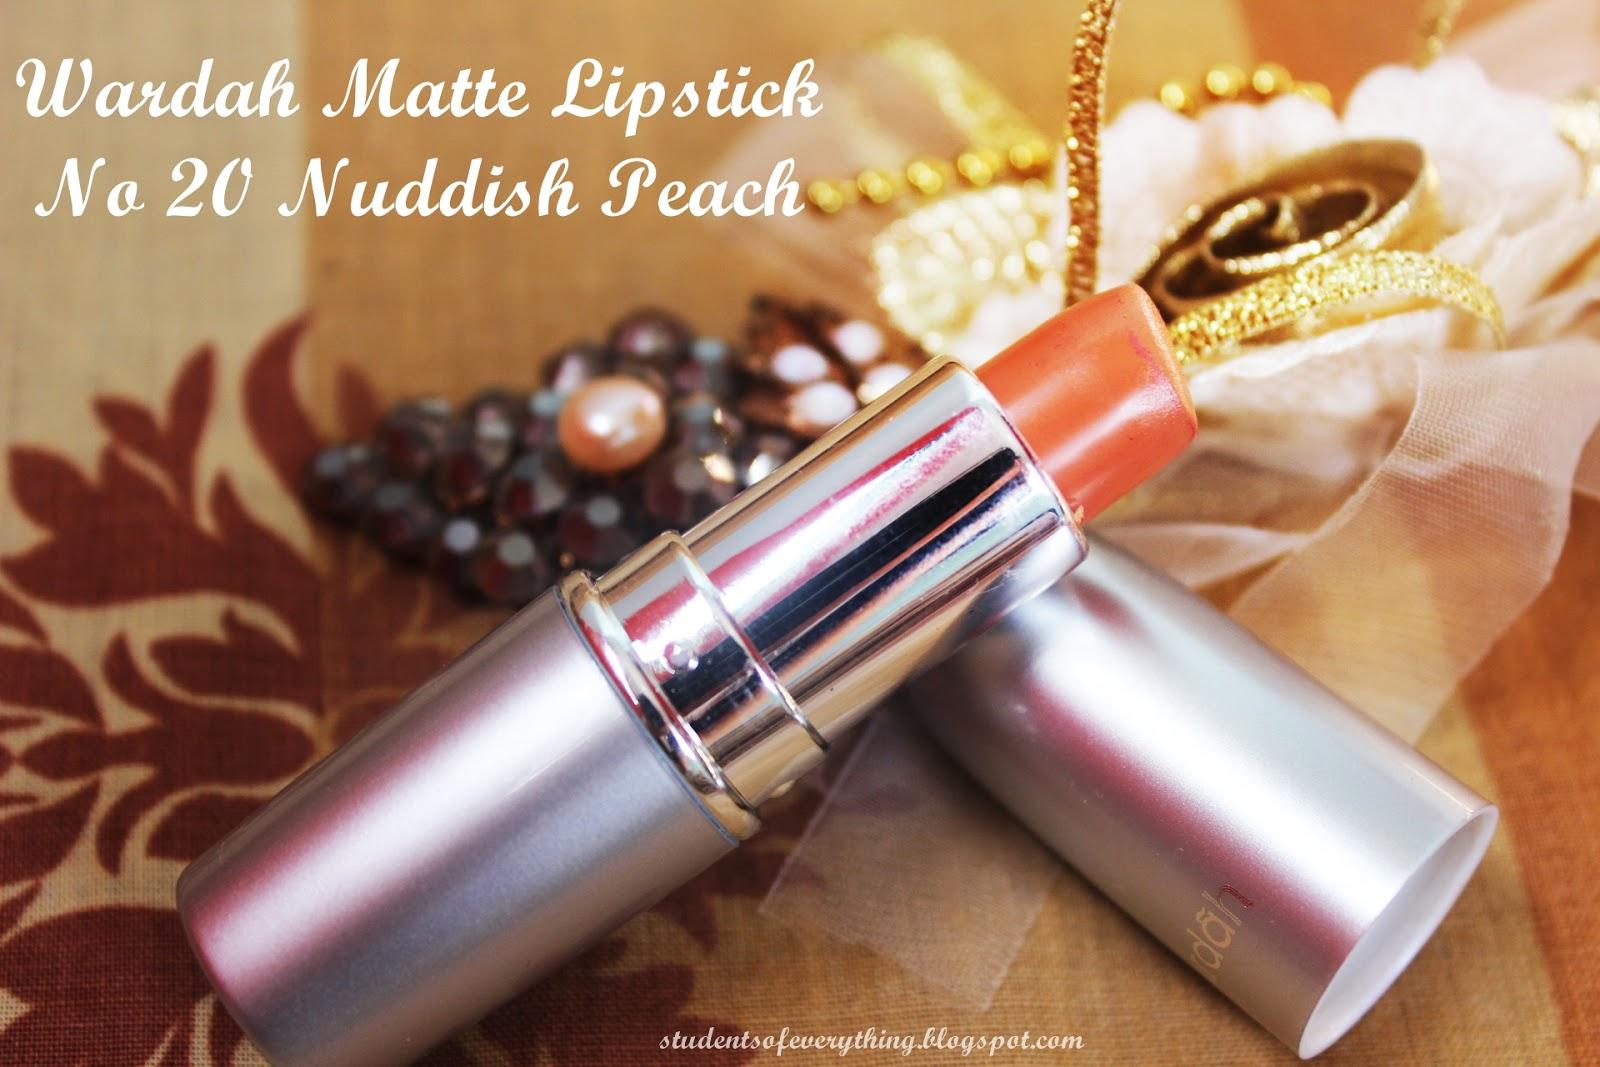 Lipstik matte wardah no 15